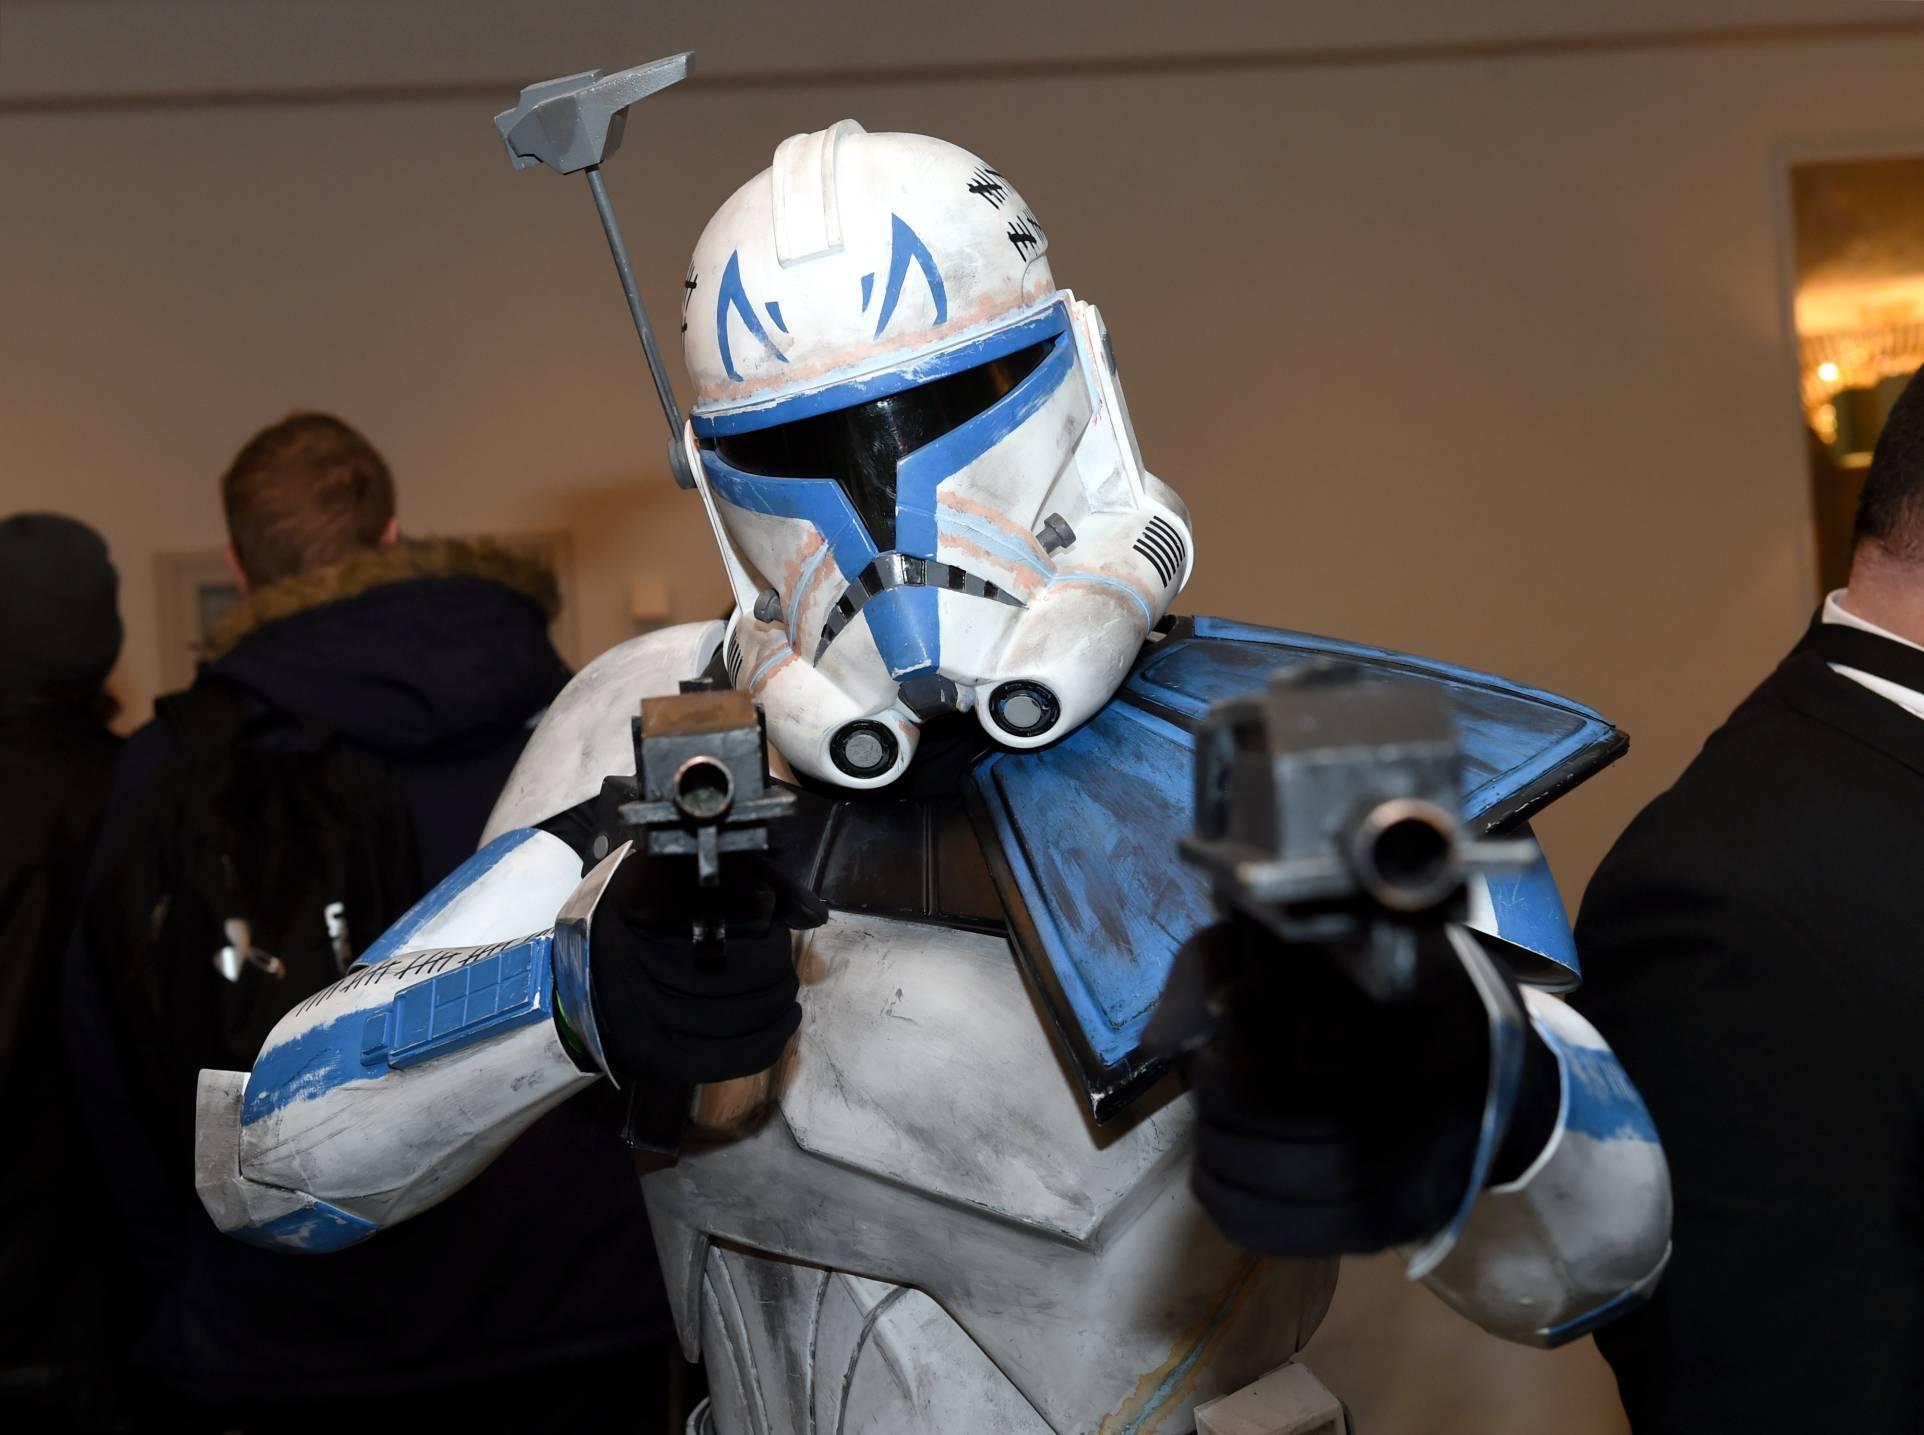 Richard Tonge as Captain Rex from Star Wars.